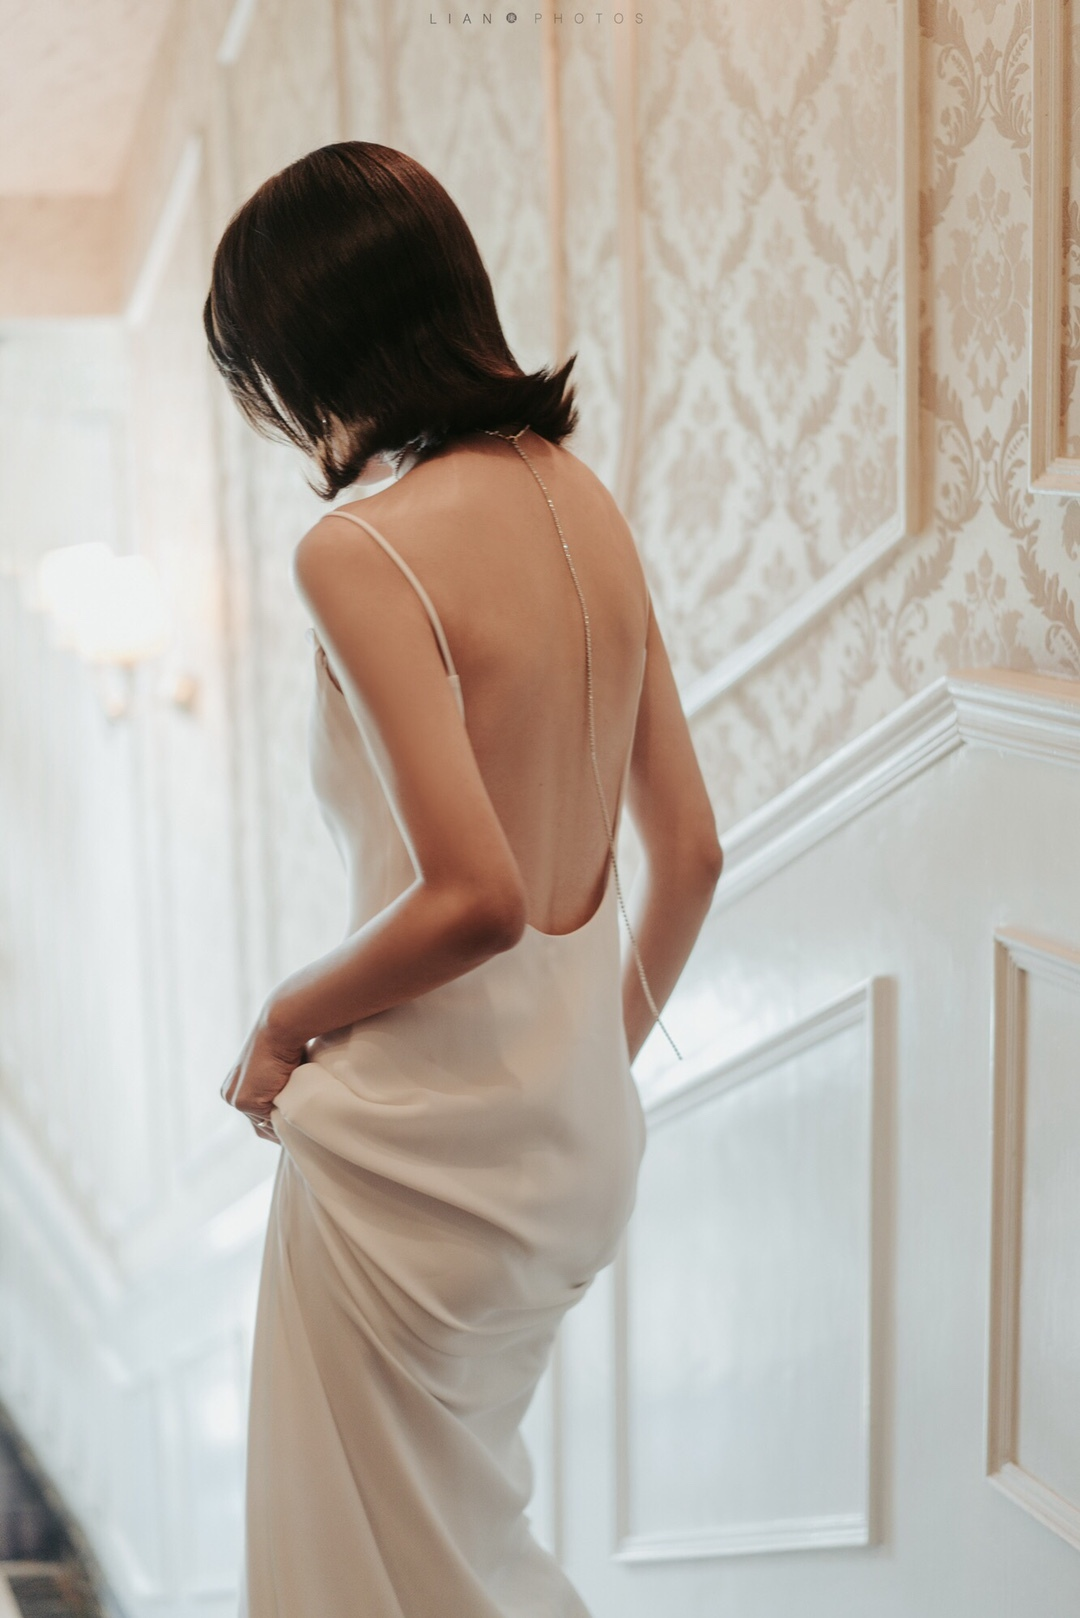 【DearWhite】ウェディングドレス Aライン プリンセス エンパイア デコルテ 結婚式 披露宴 二次会 パーティーウェディングドレス・カラードレス・サイズオーダー格安オーダーメイド DW00013